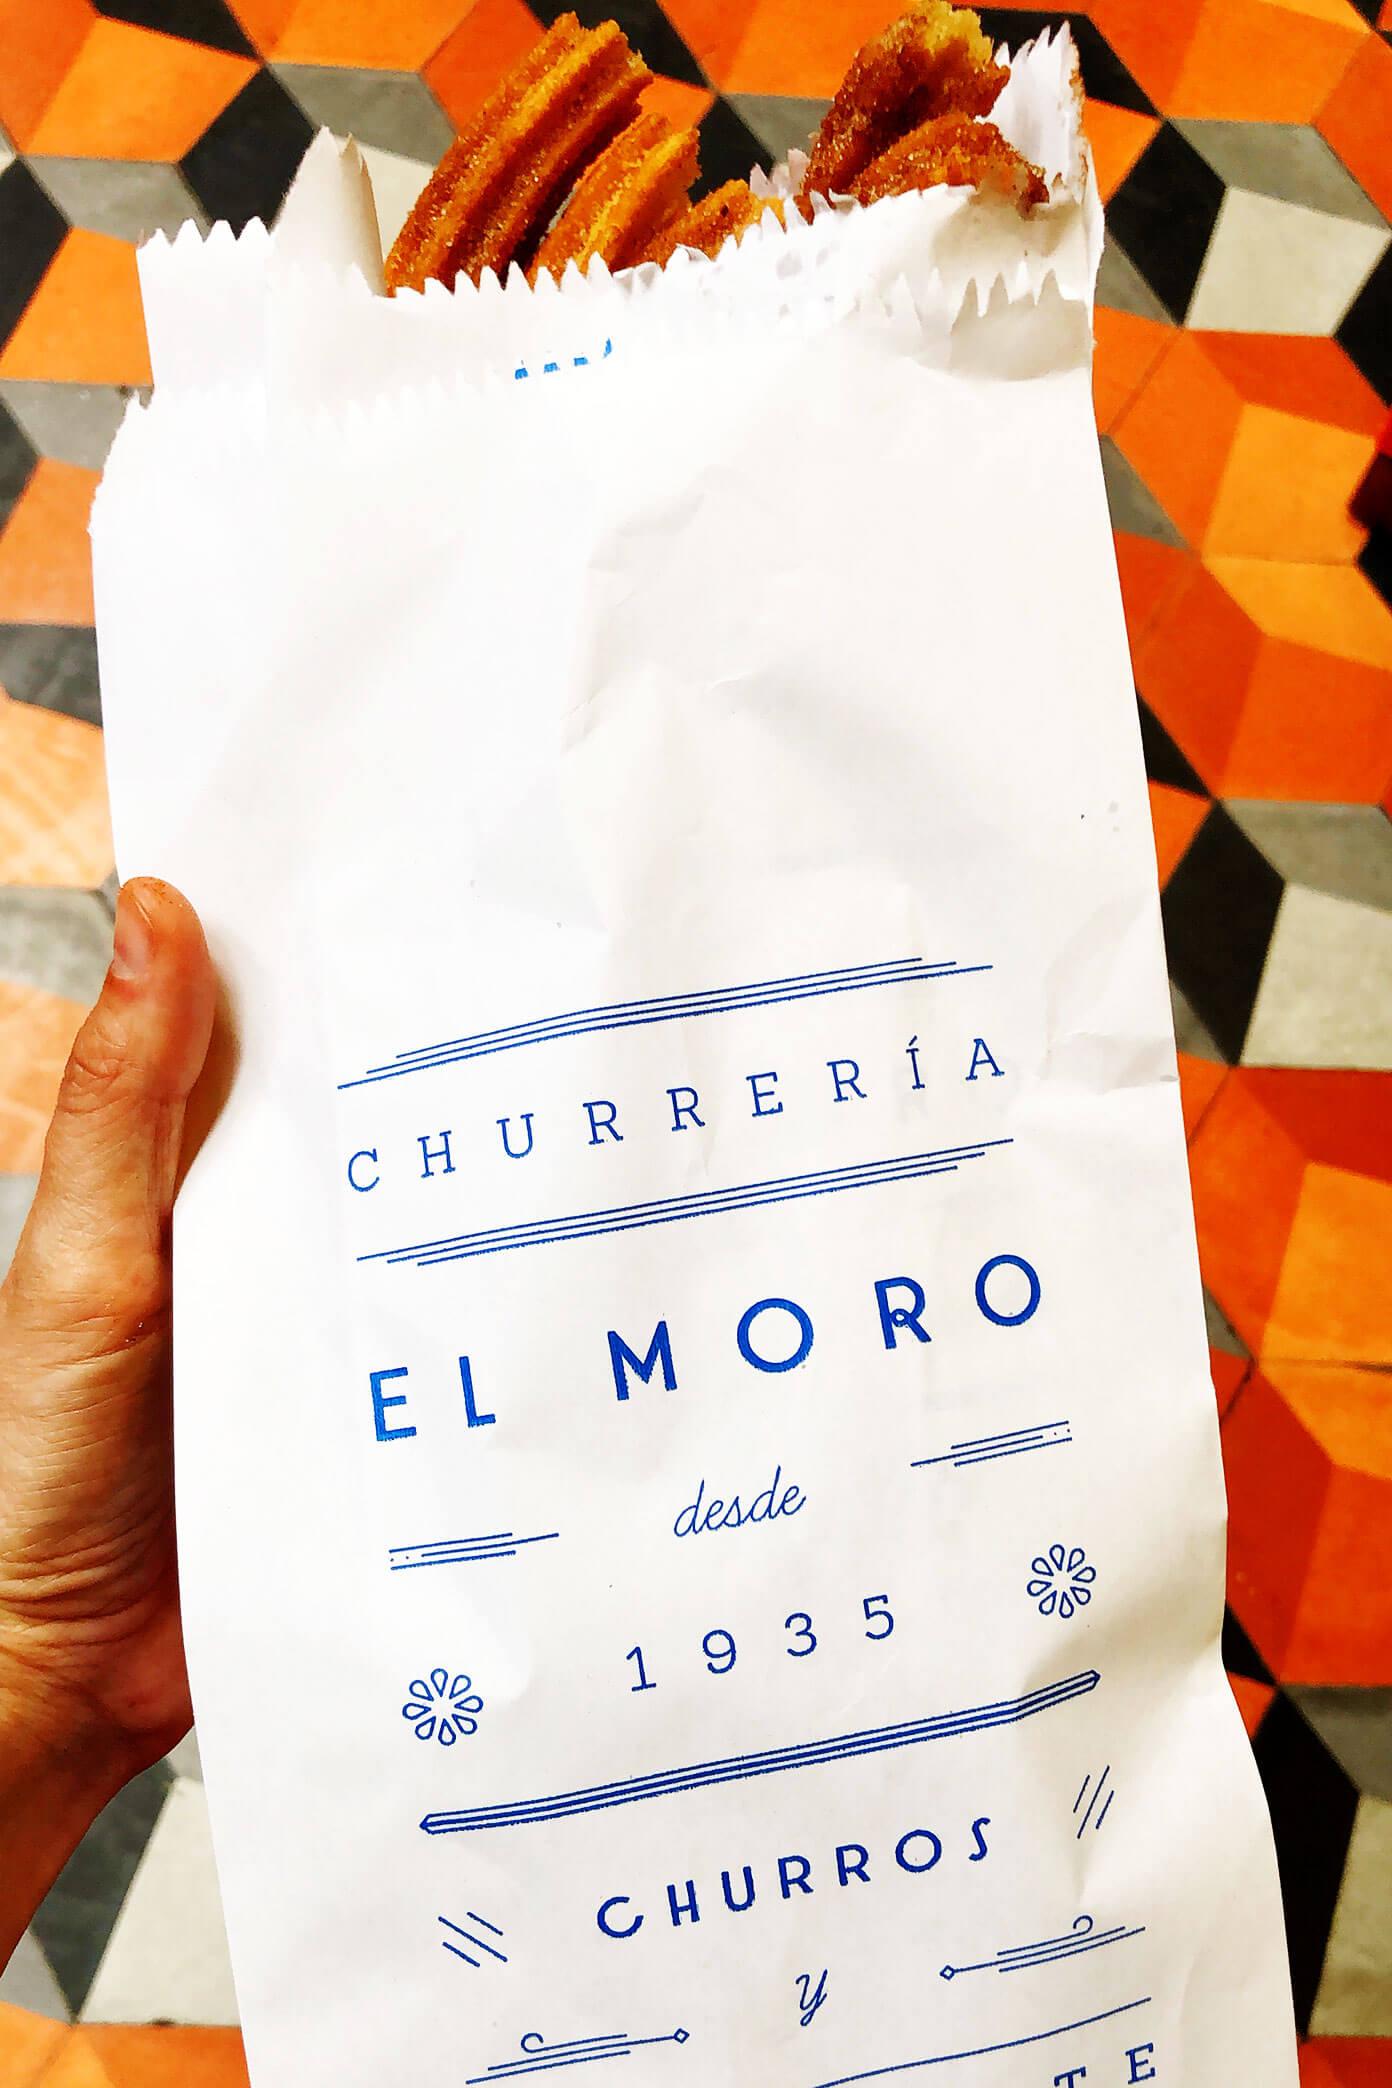 El Moro Churros | Ali's Guide To Mexico City